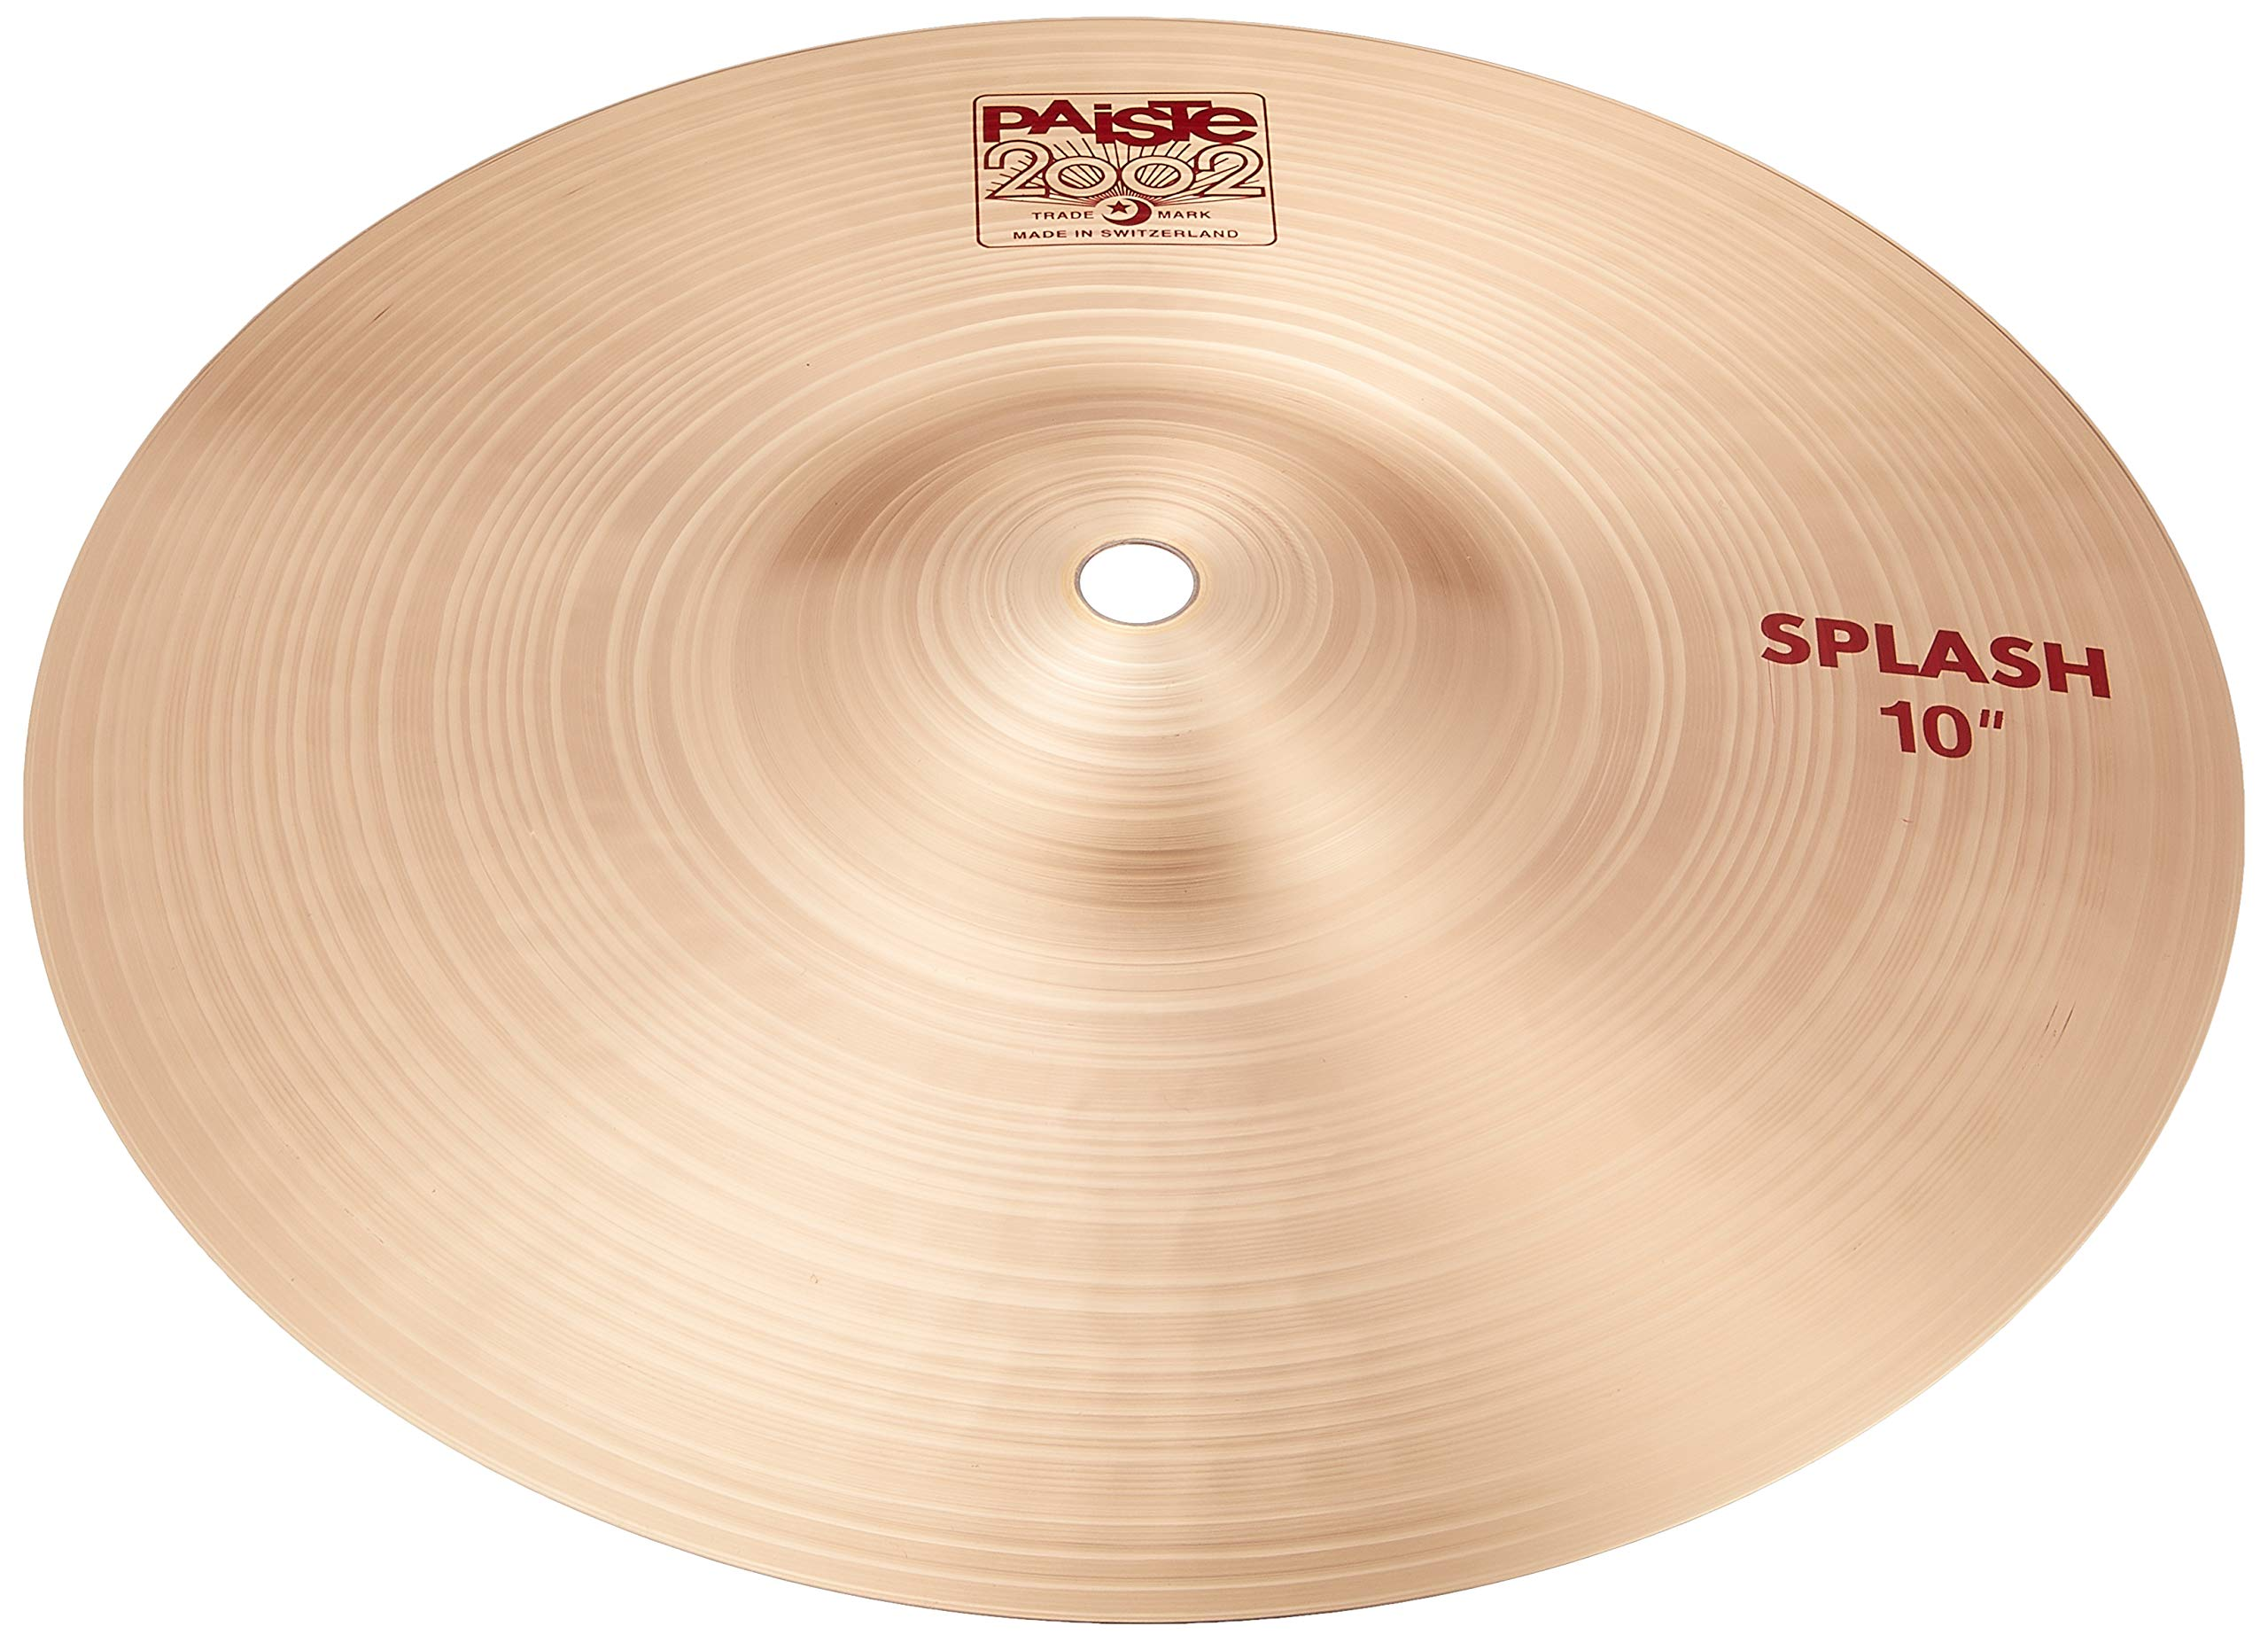 Paiste 2002 Classic Cymbal Splash 10-inch by Paiste